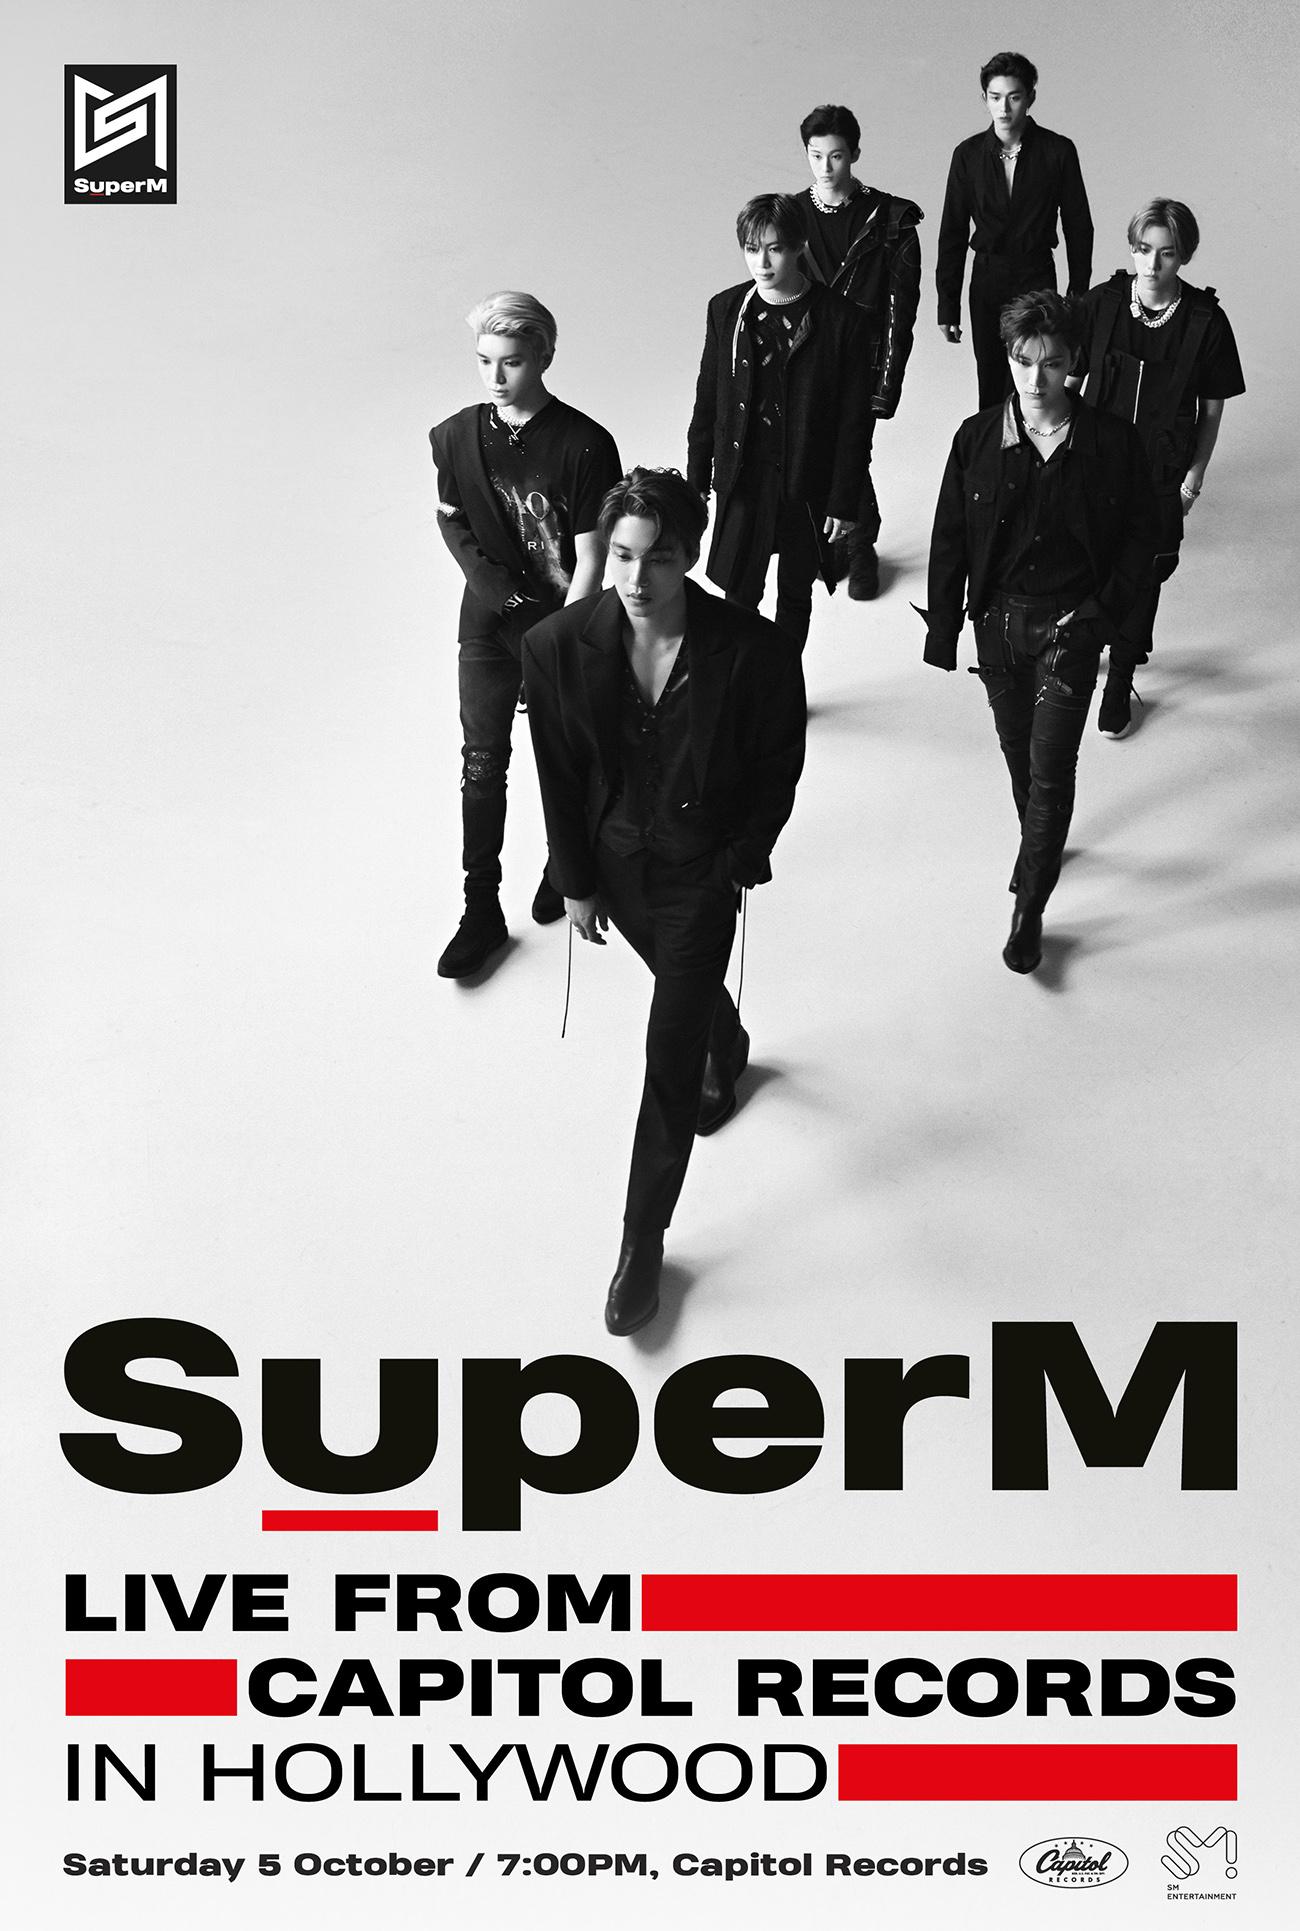 SuperM 쇼케이스 포스터 (1).jpg